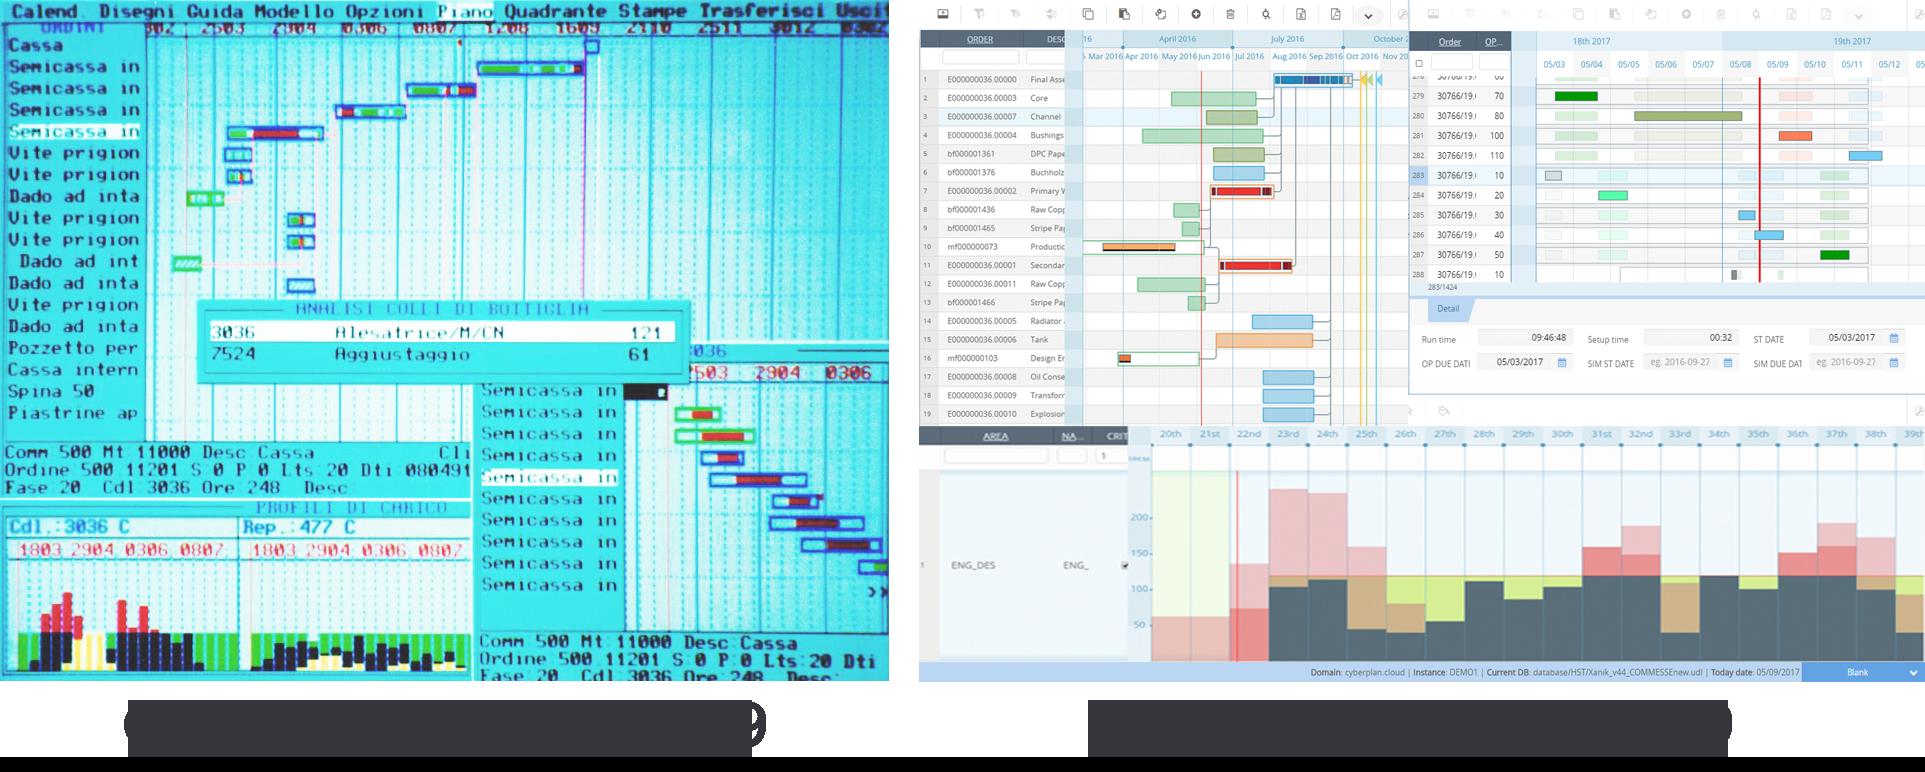 1991 primo cyb-1